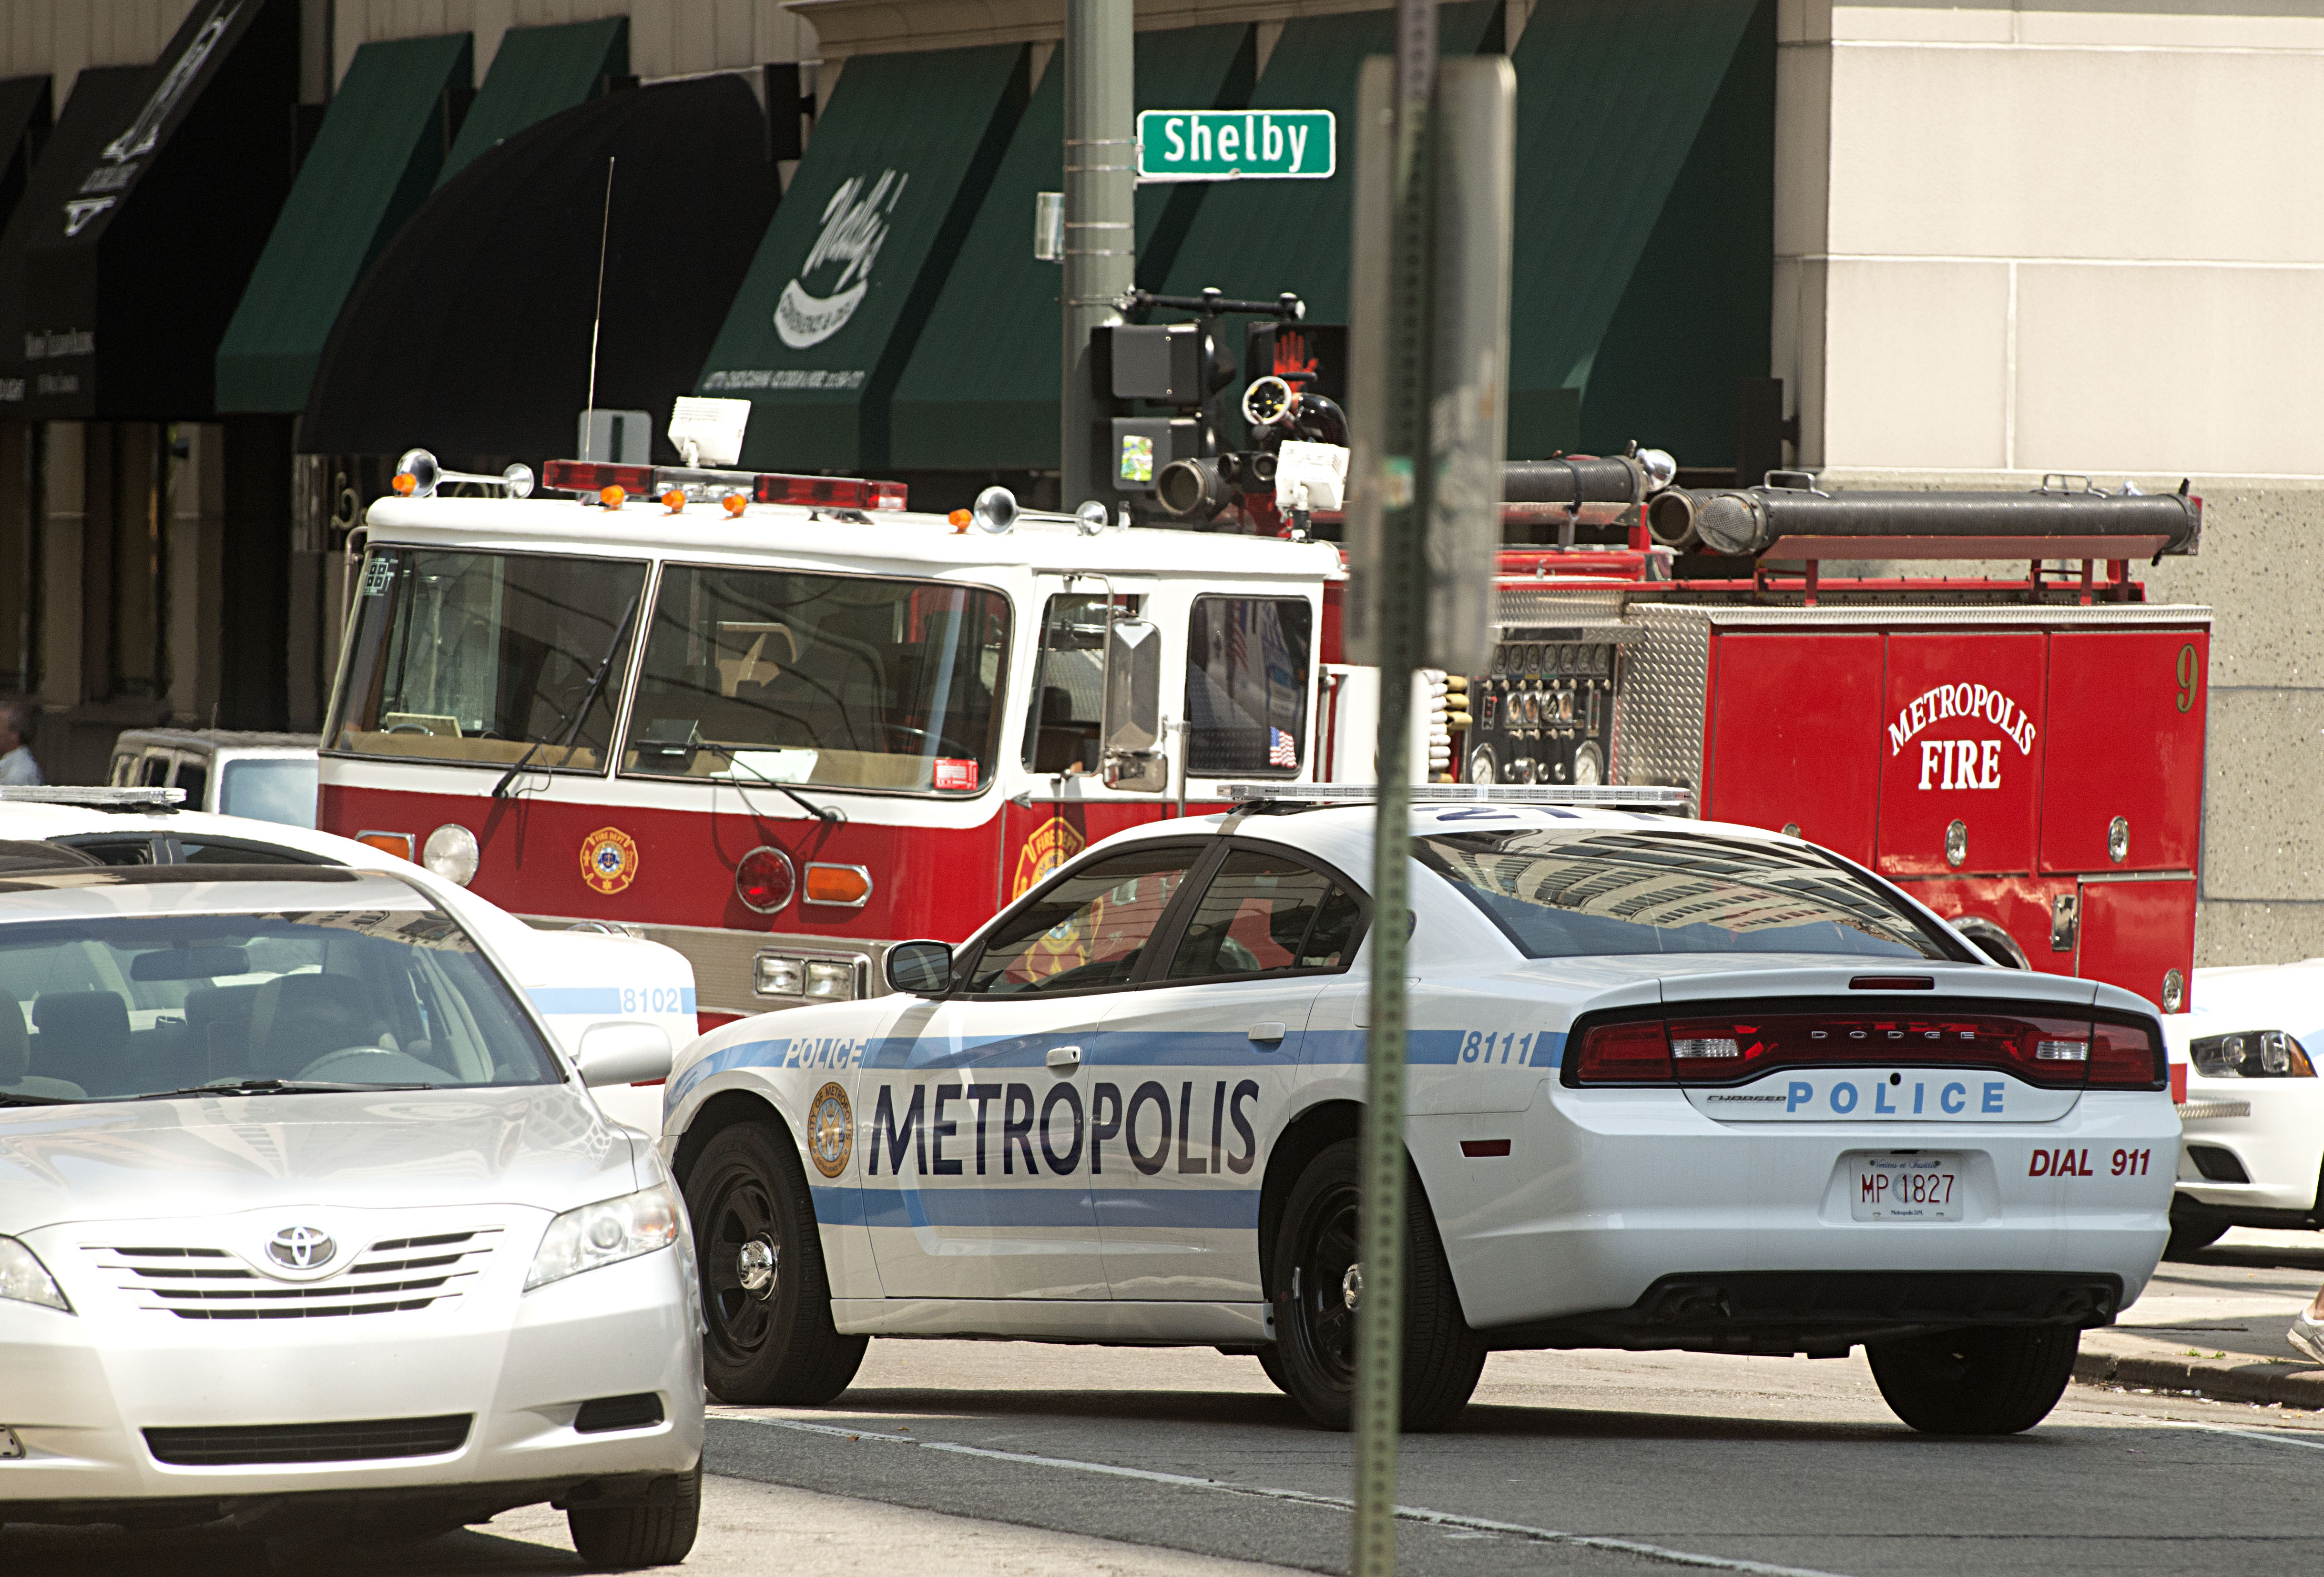 Detroit serves as the backdrop for Superman's fictional city of Metropolis.